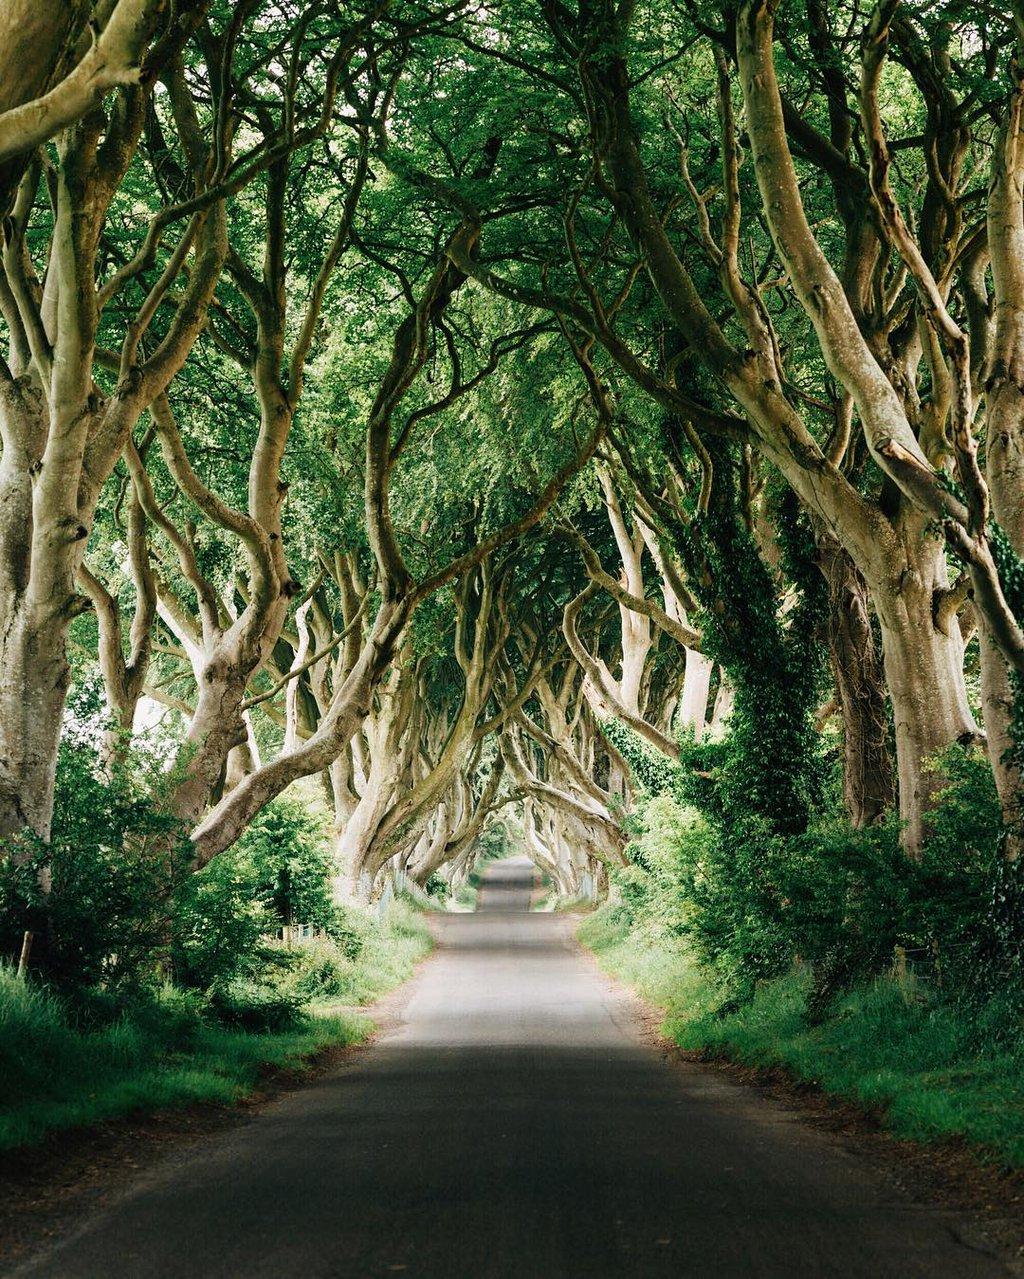 The Dark Hedges, County Antrim, Northern Ireland | Photography by ©@tannerwendell https://t.co/gsovgQ5LTk